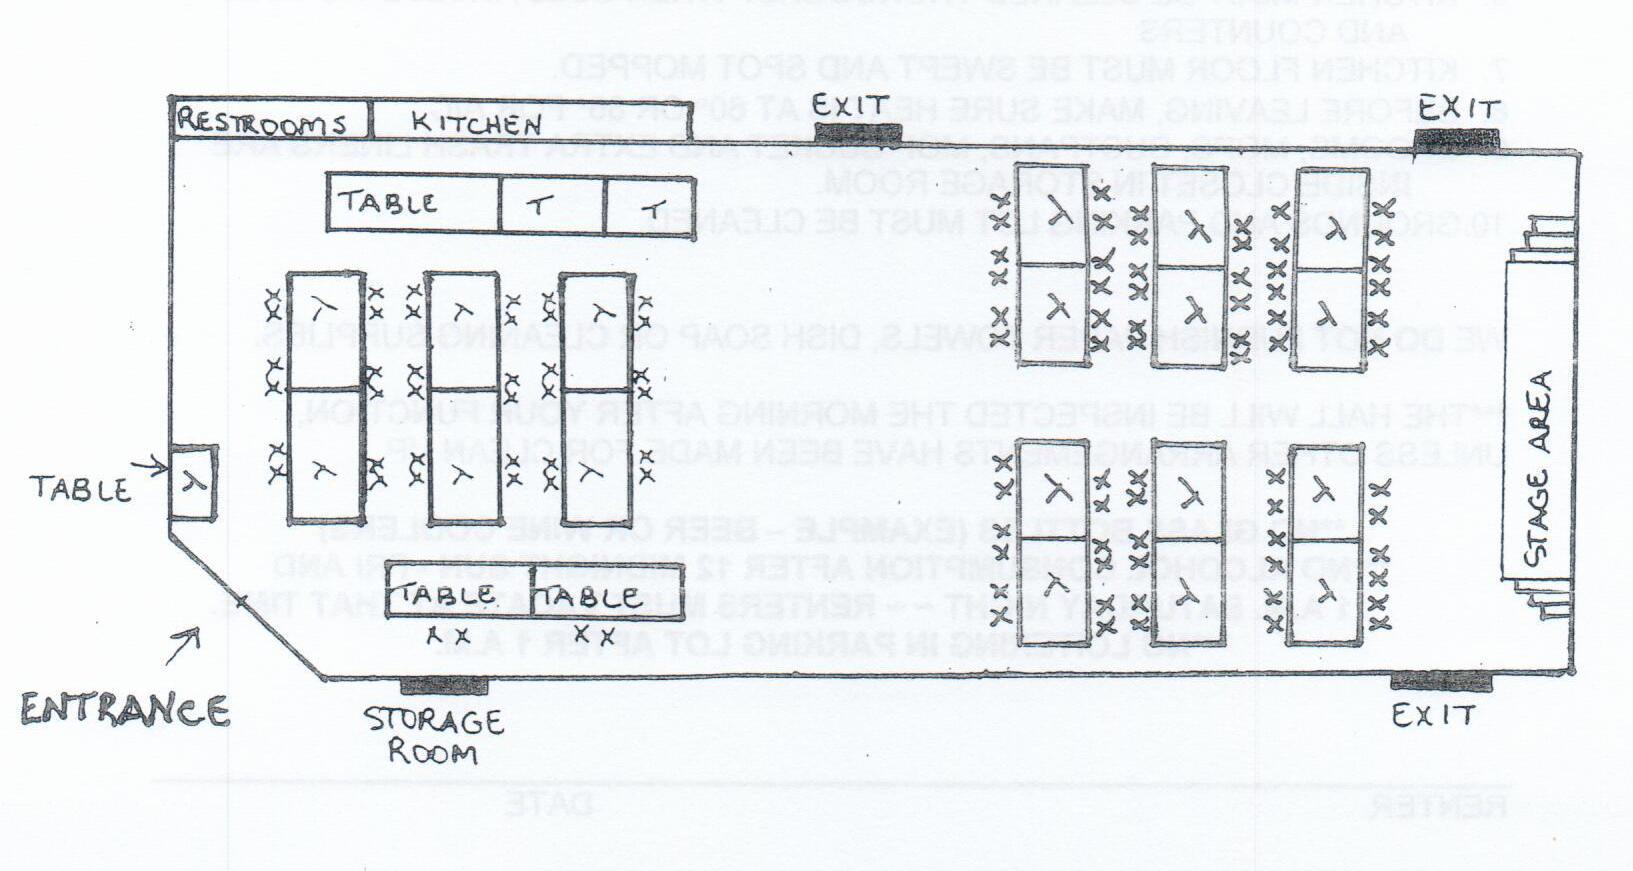 Civic Center Layout Diagram